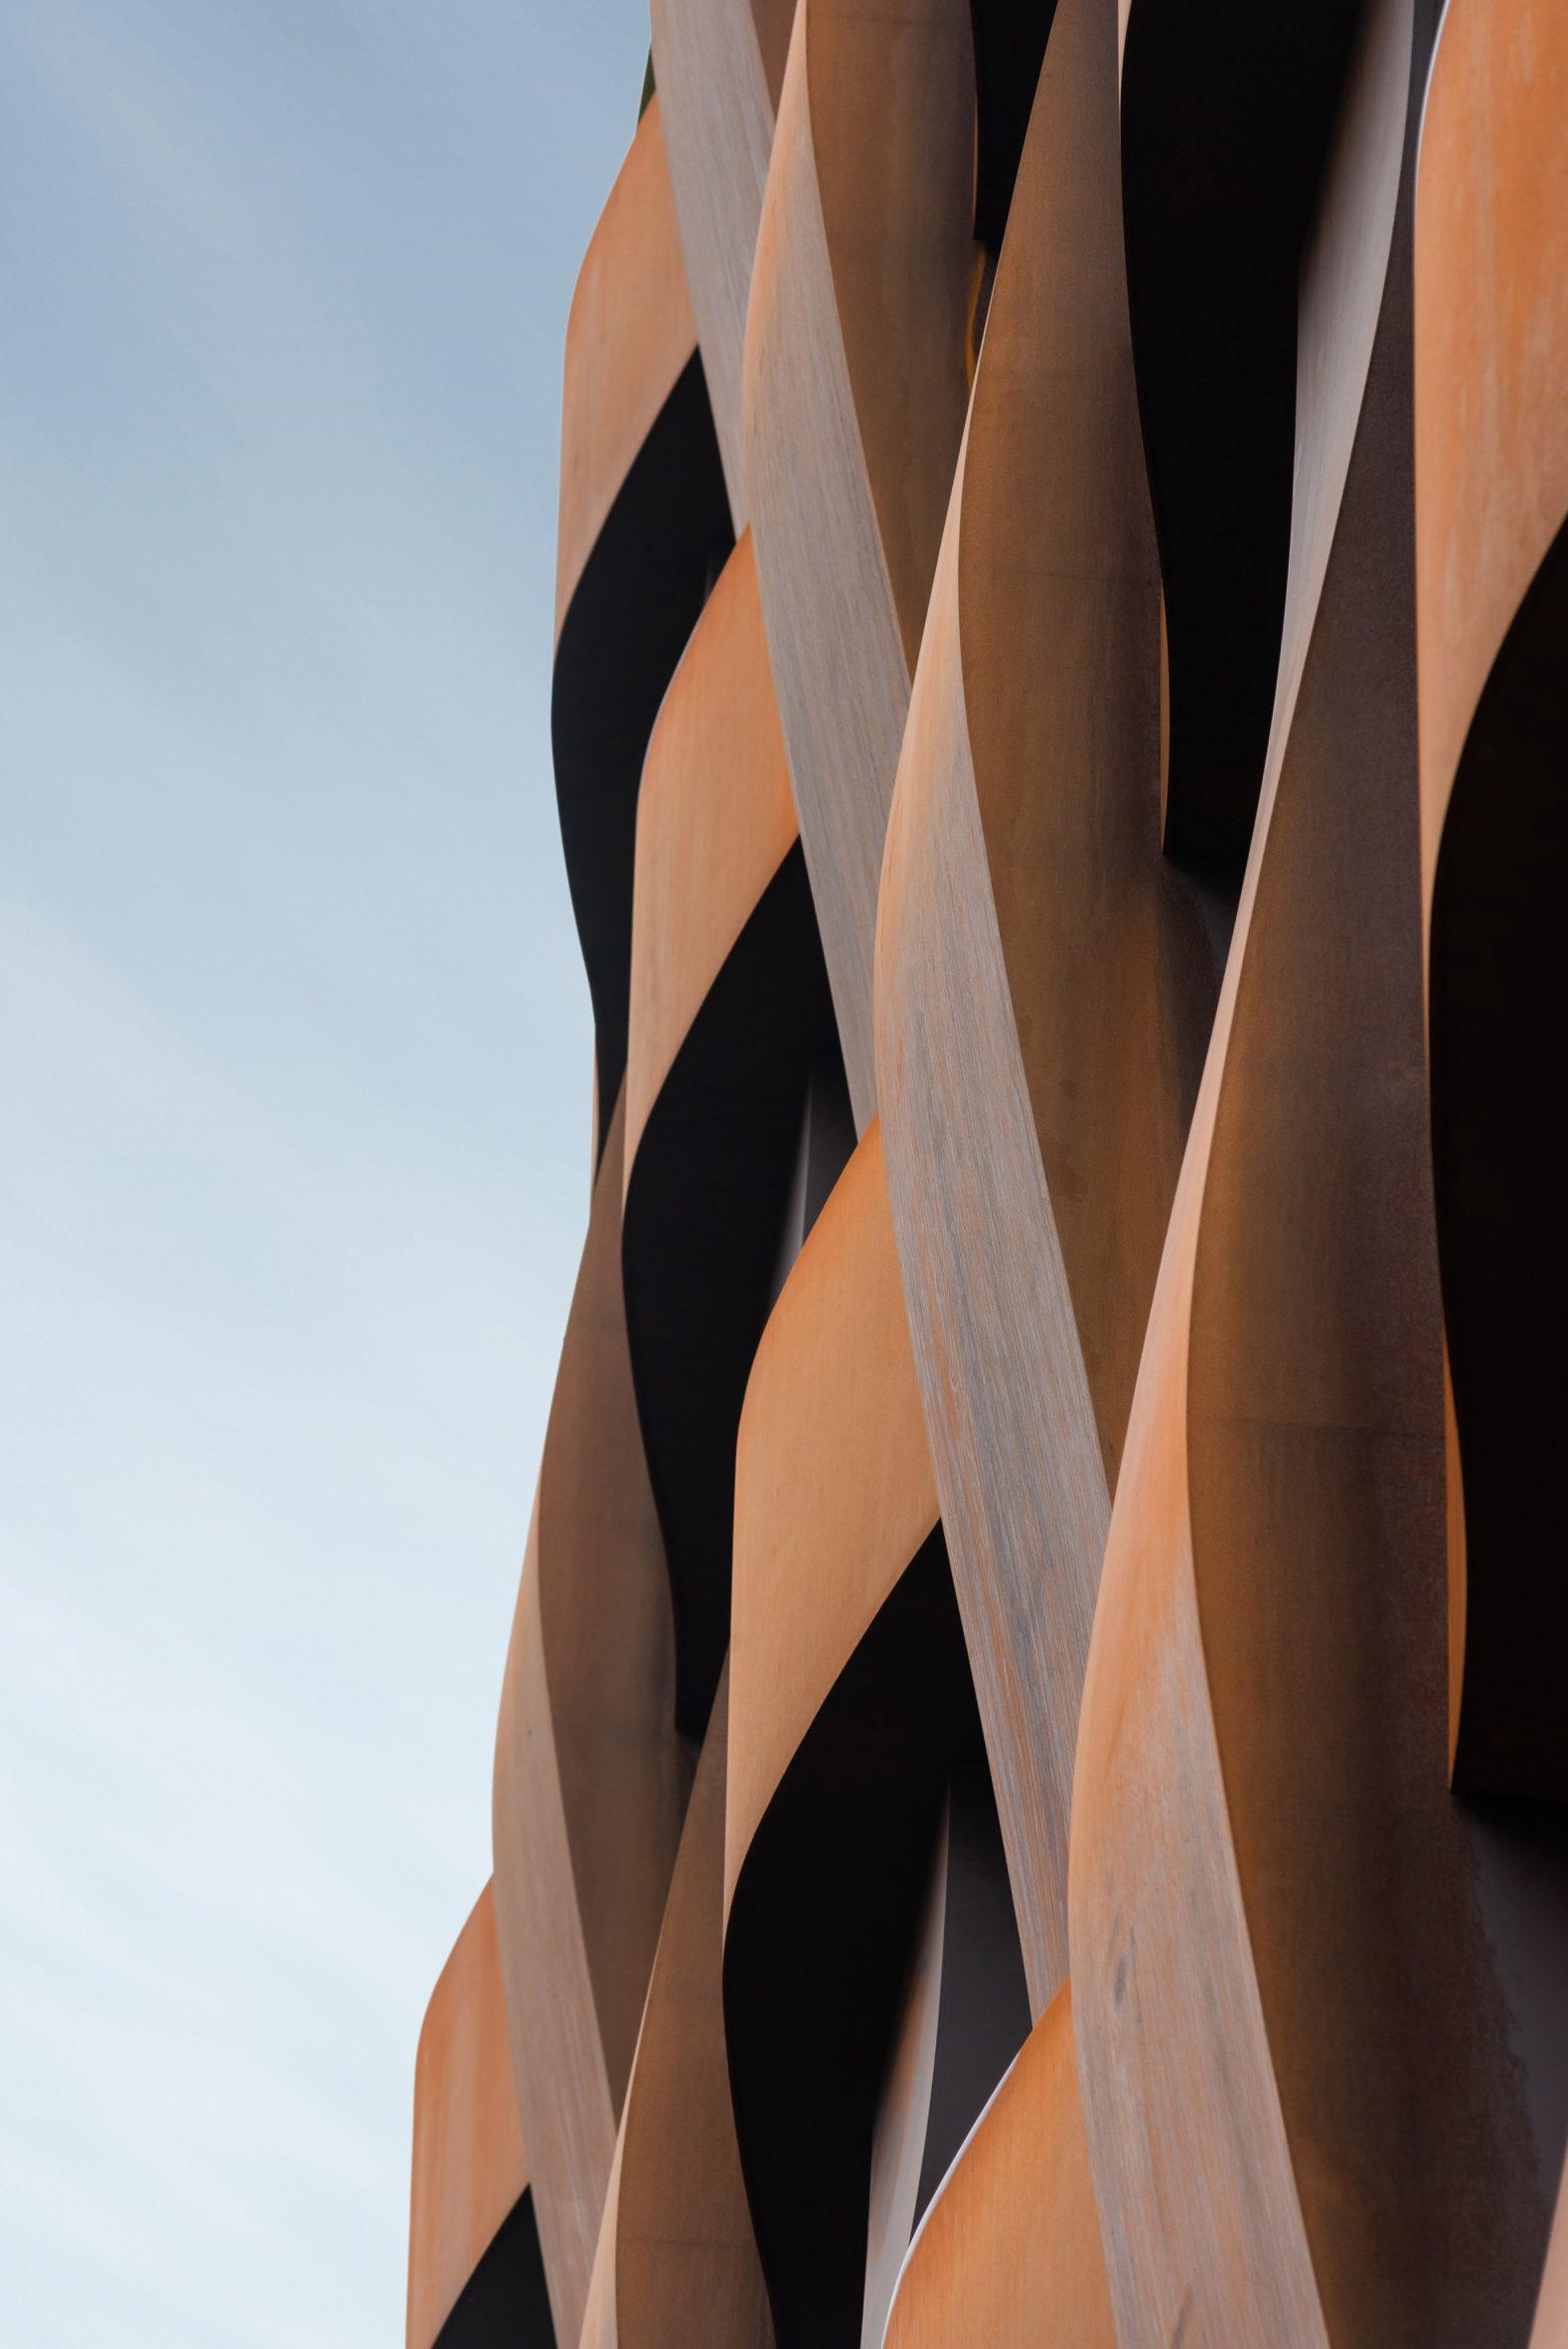 Close up of Corten steel panels in basket-weave effect